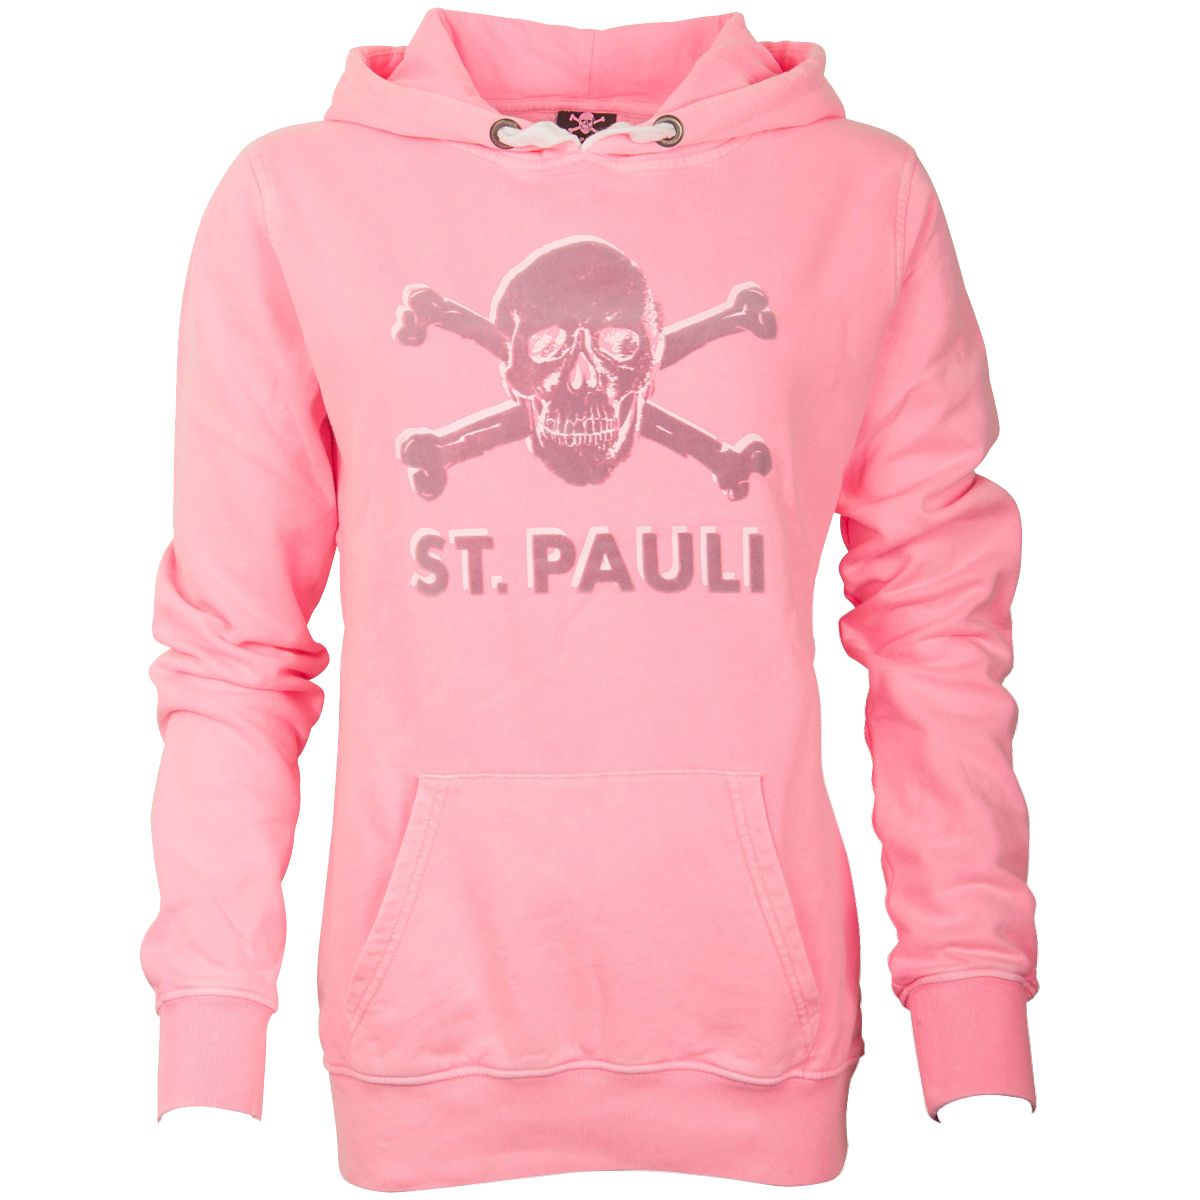 FC St. Pauli - Damen Kapuzenpullover Ruby Totenkopf - pink